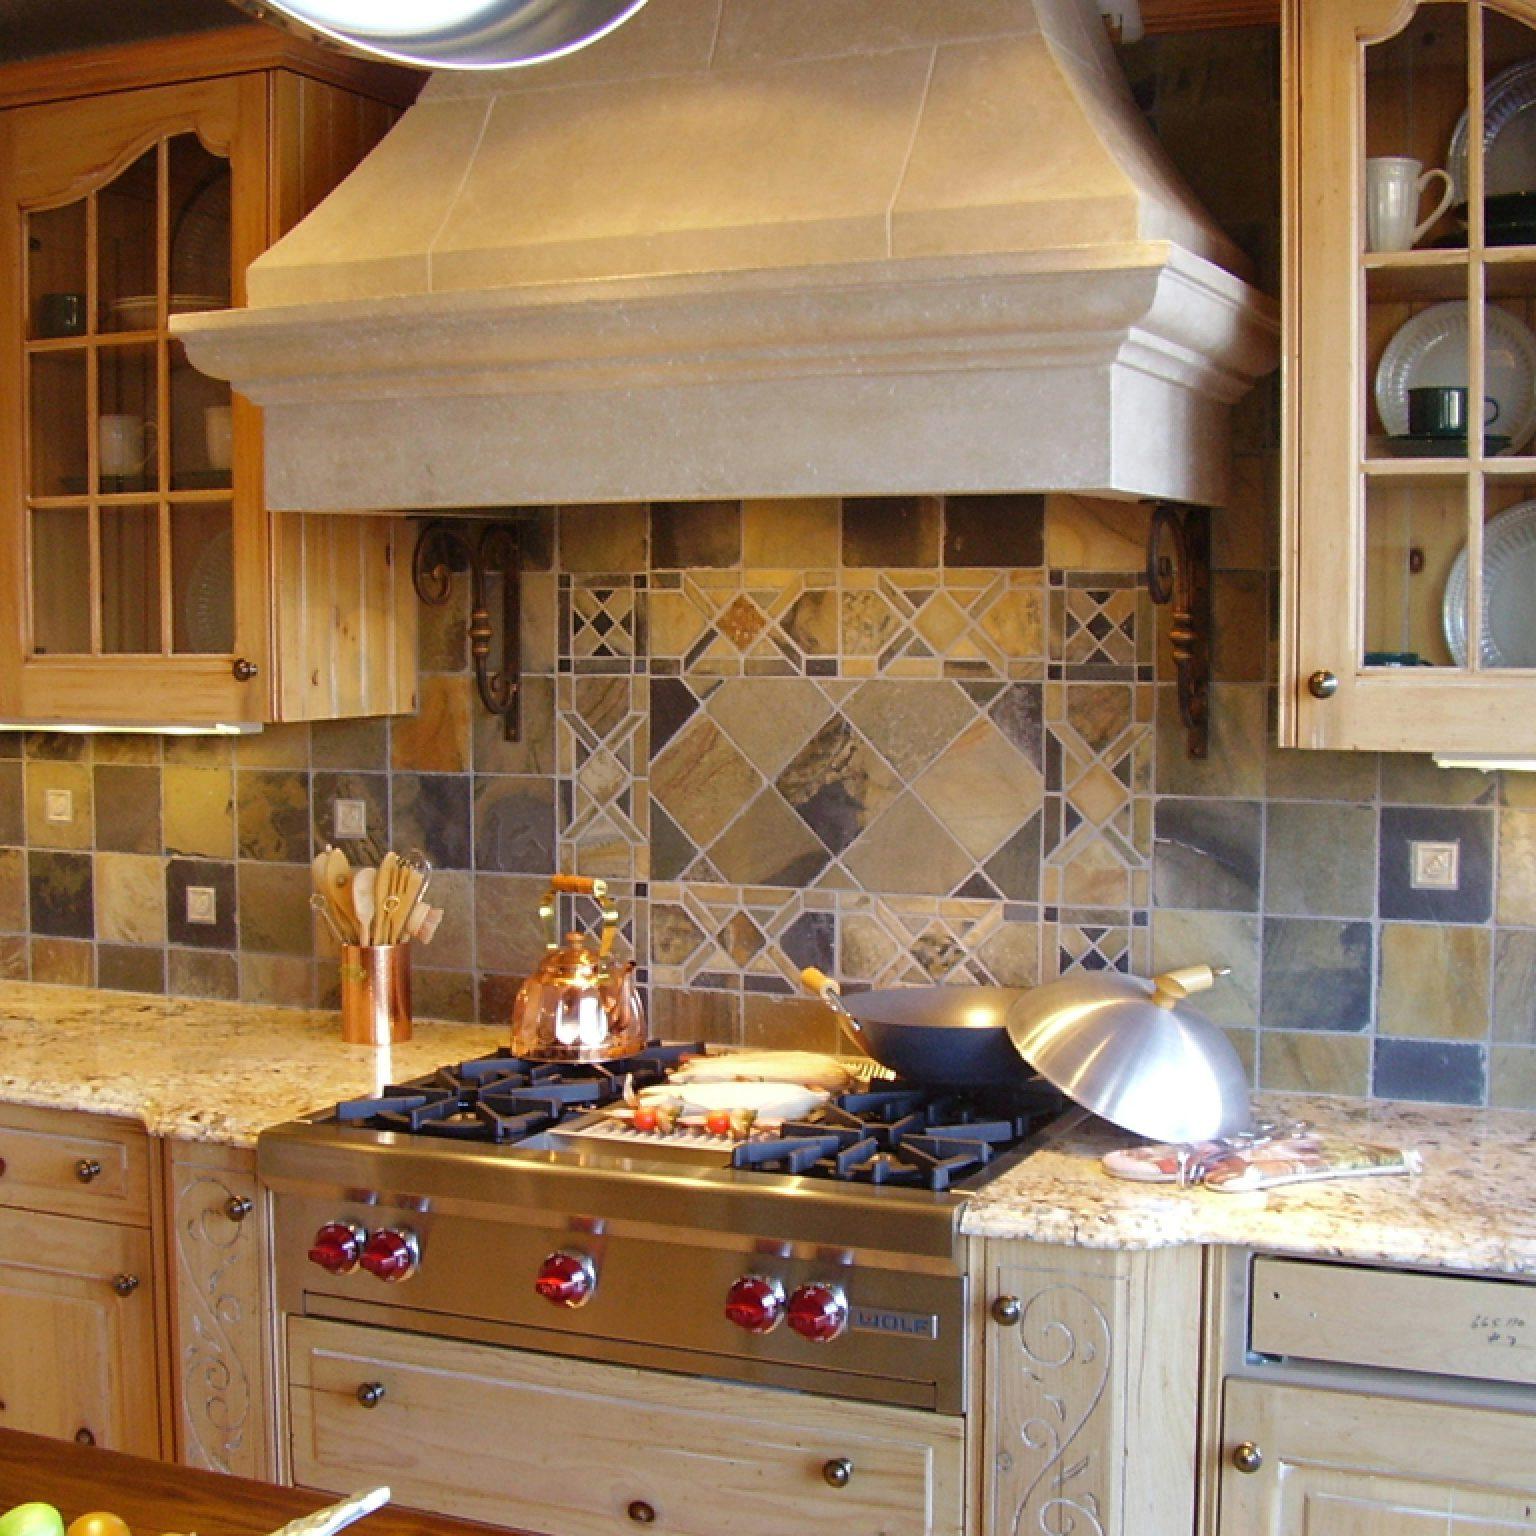 Image of: Kitchen Hood Vents Kitchen Rustic Stove Vent For Rustic Kitchen Interior Design Idea Kitchen Range Hood Ideas For Contemporary Rustic Kitchen Decorating Design Idea Golden Art